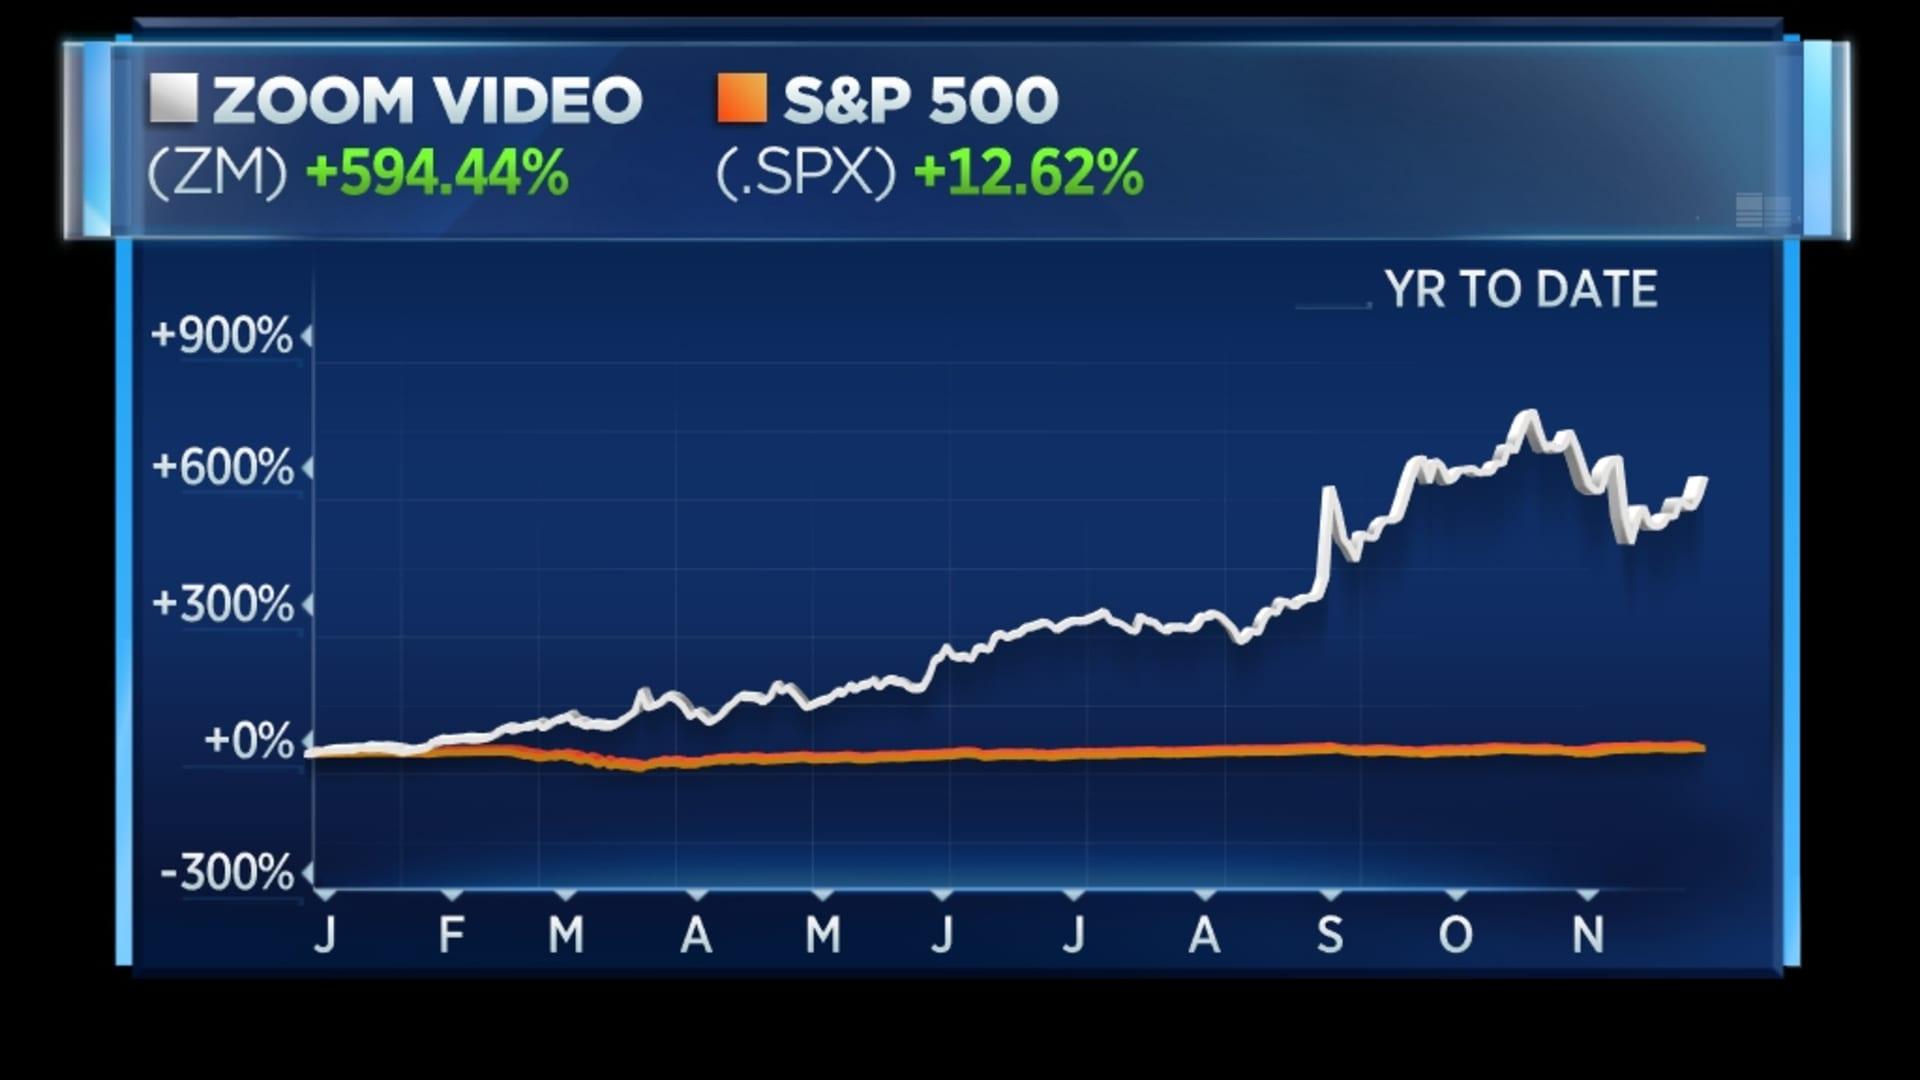 Zoom vs. S&P 500 this year